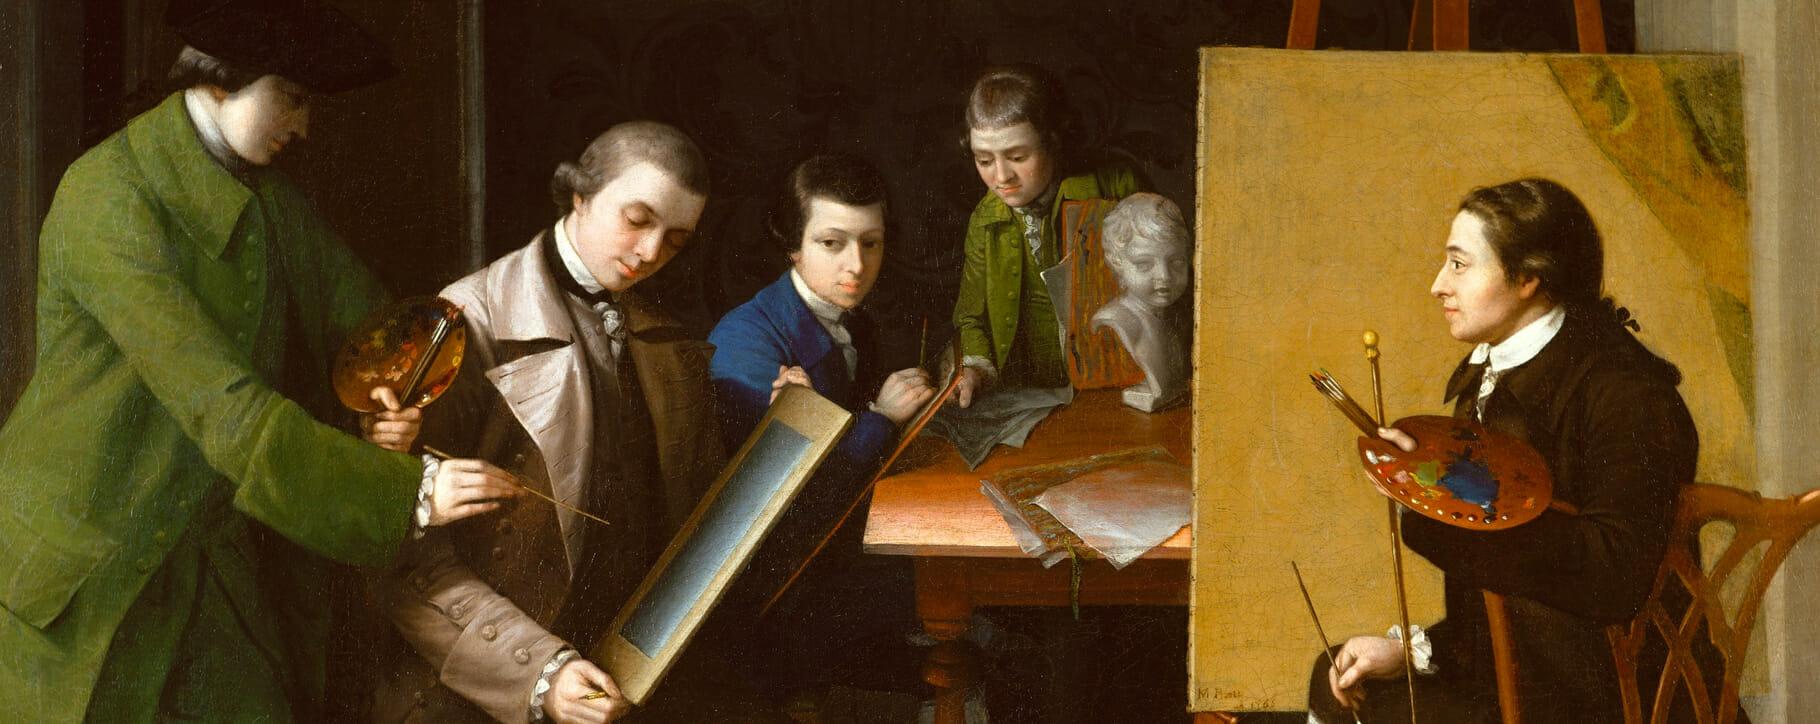 Artist Studio 18th century